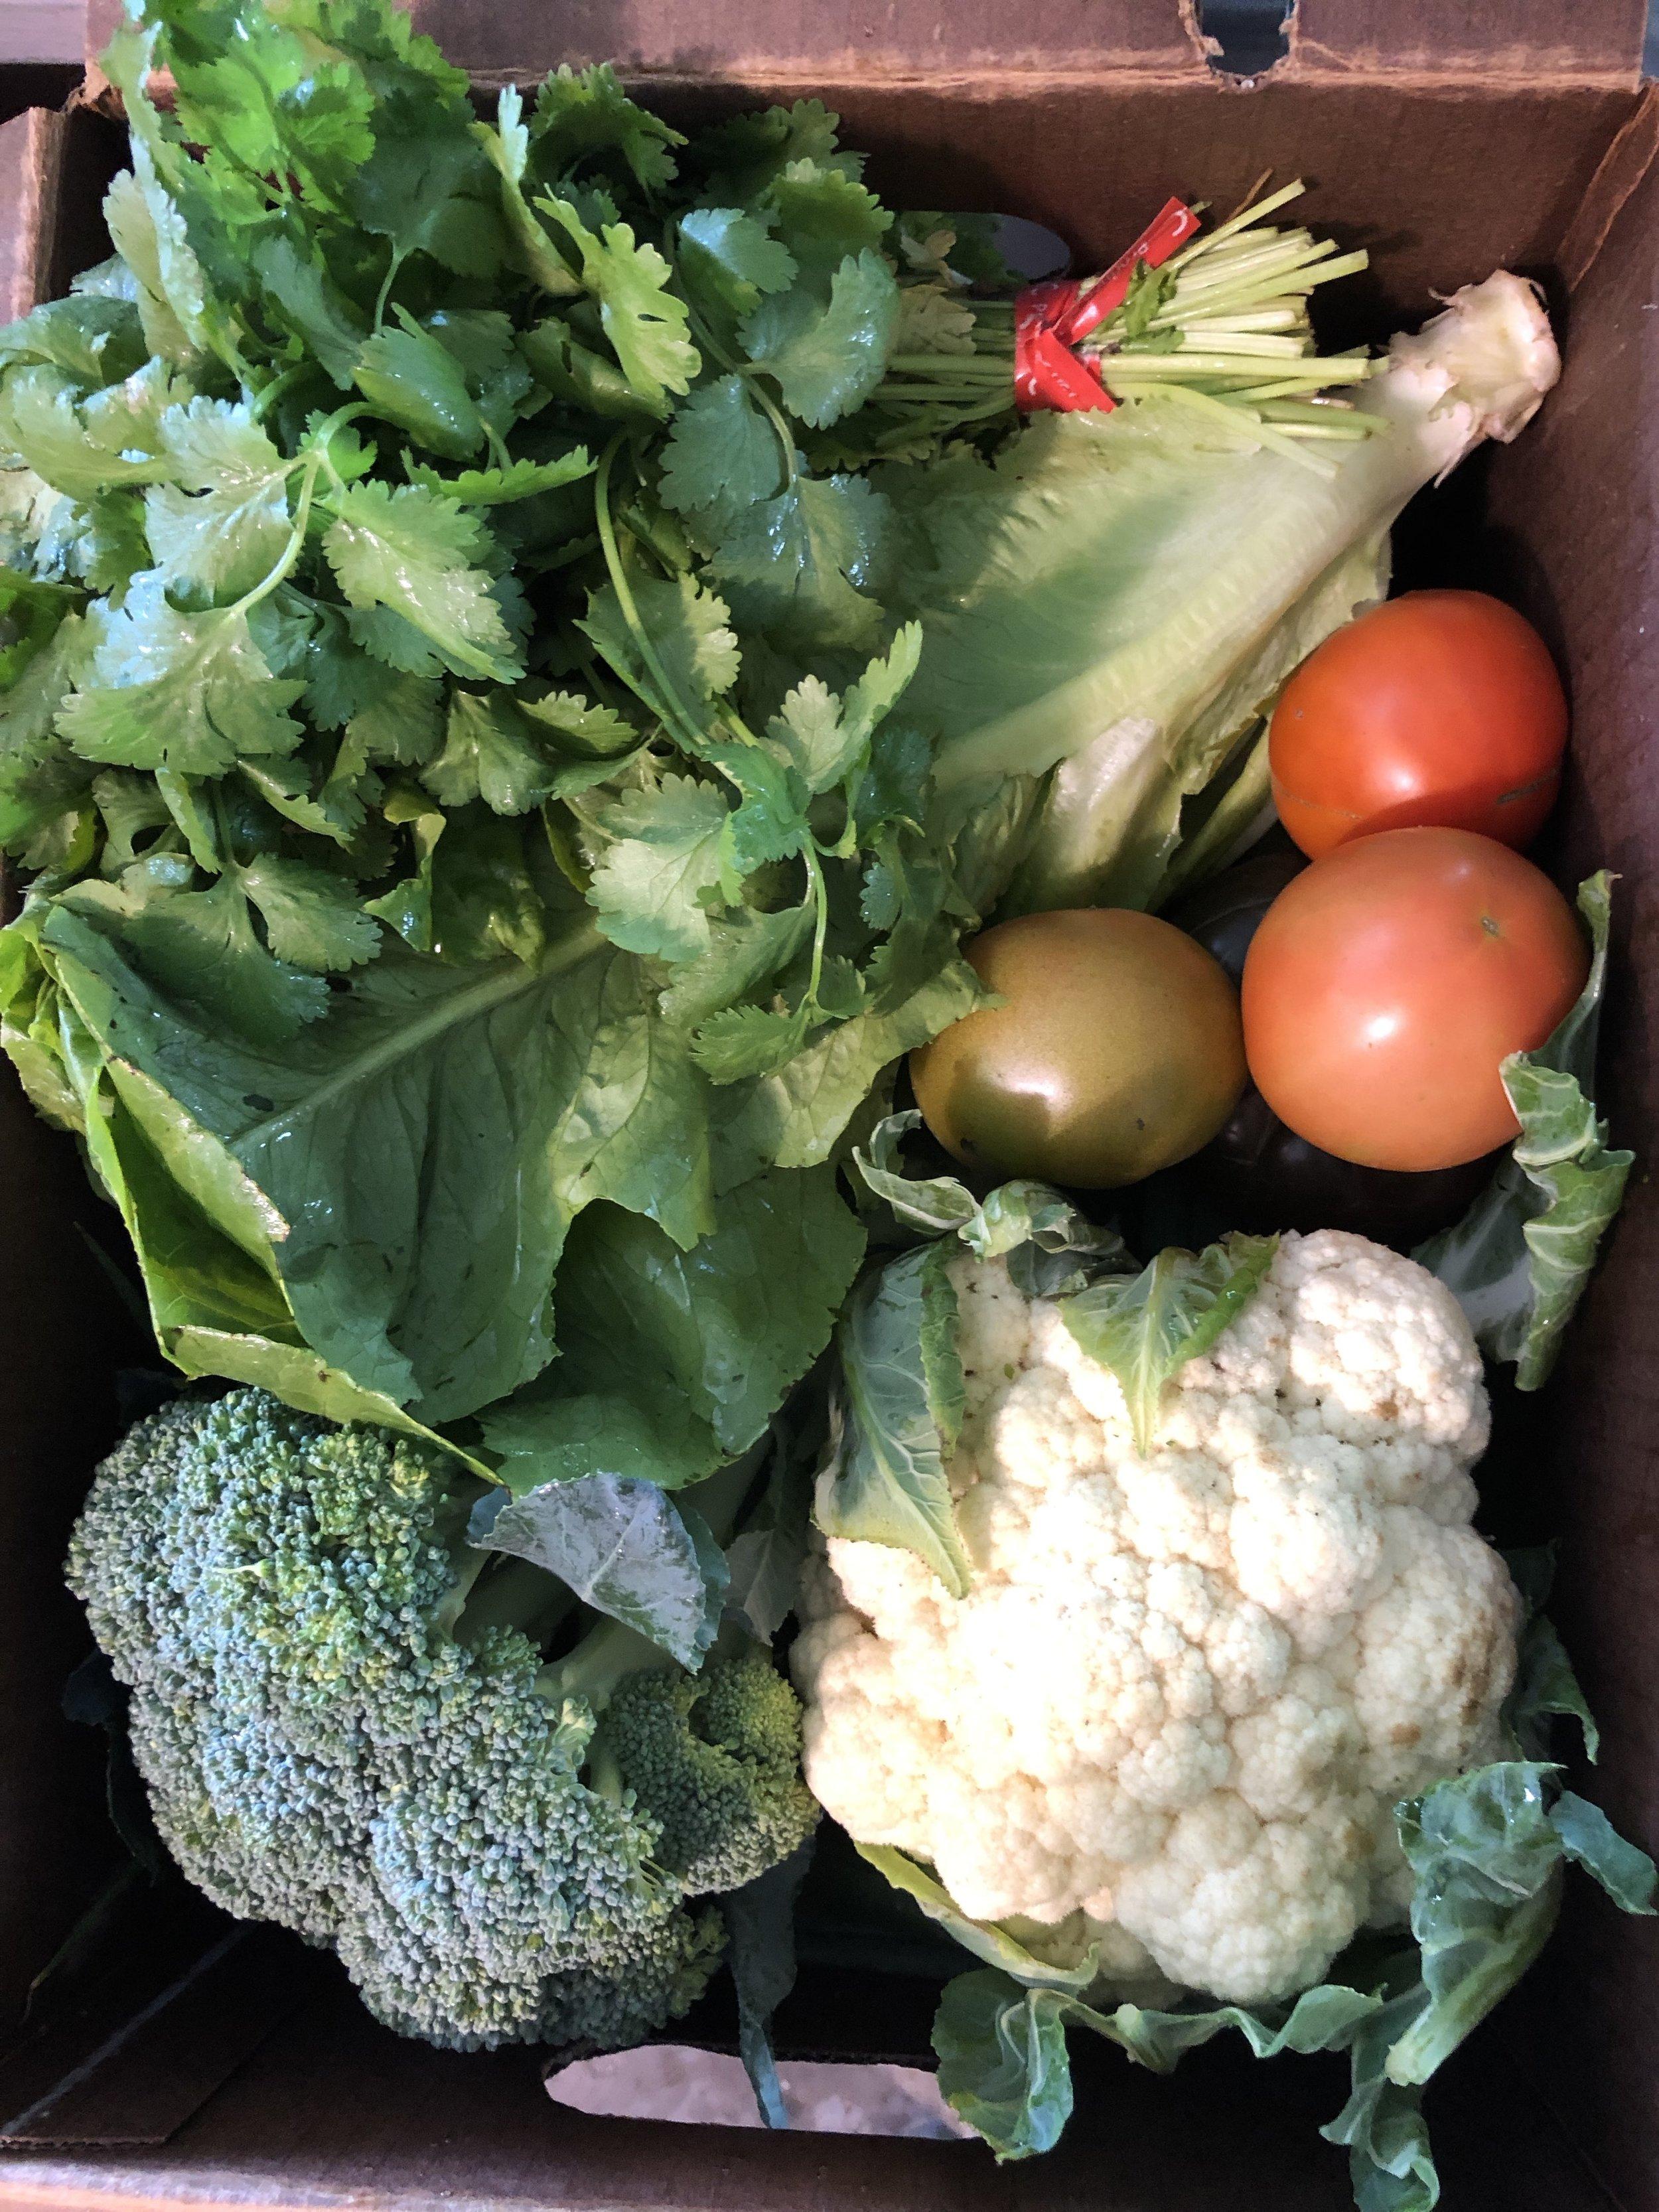 enjoy your veggies!